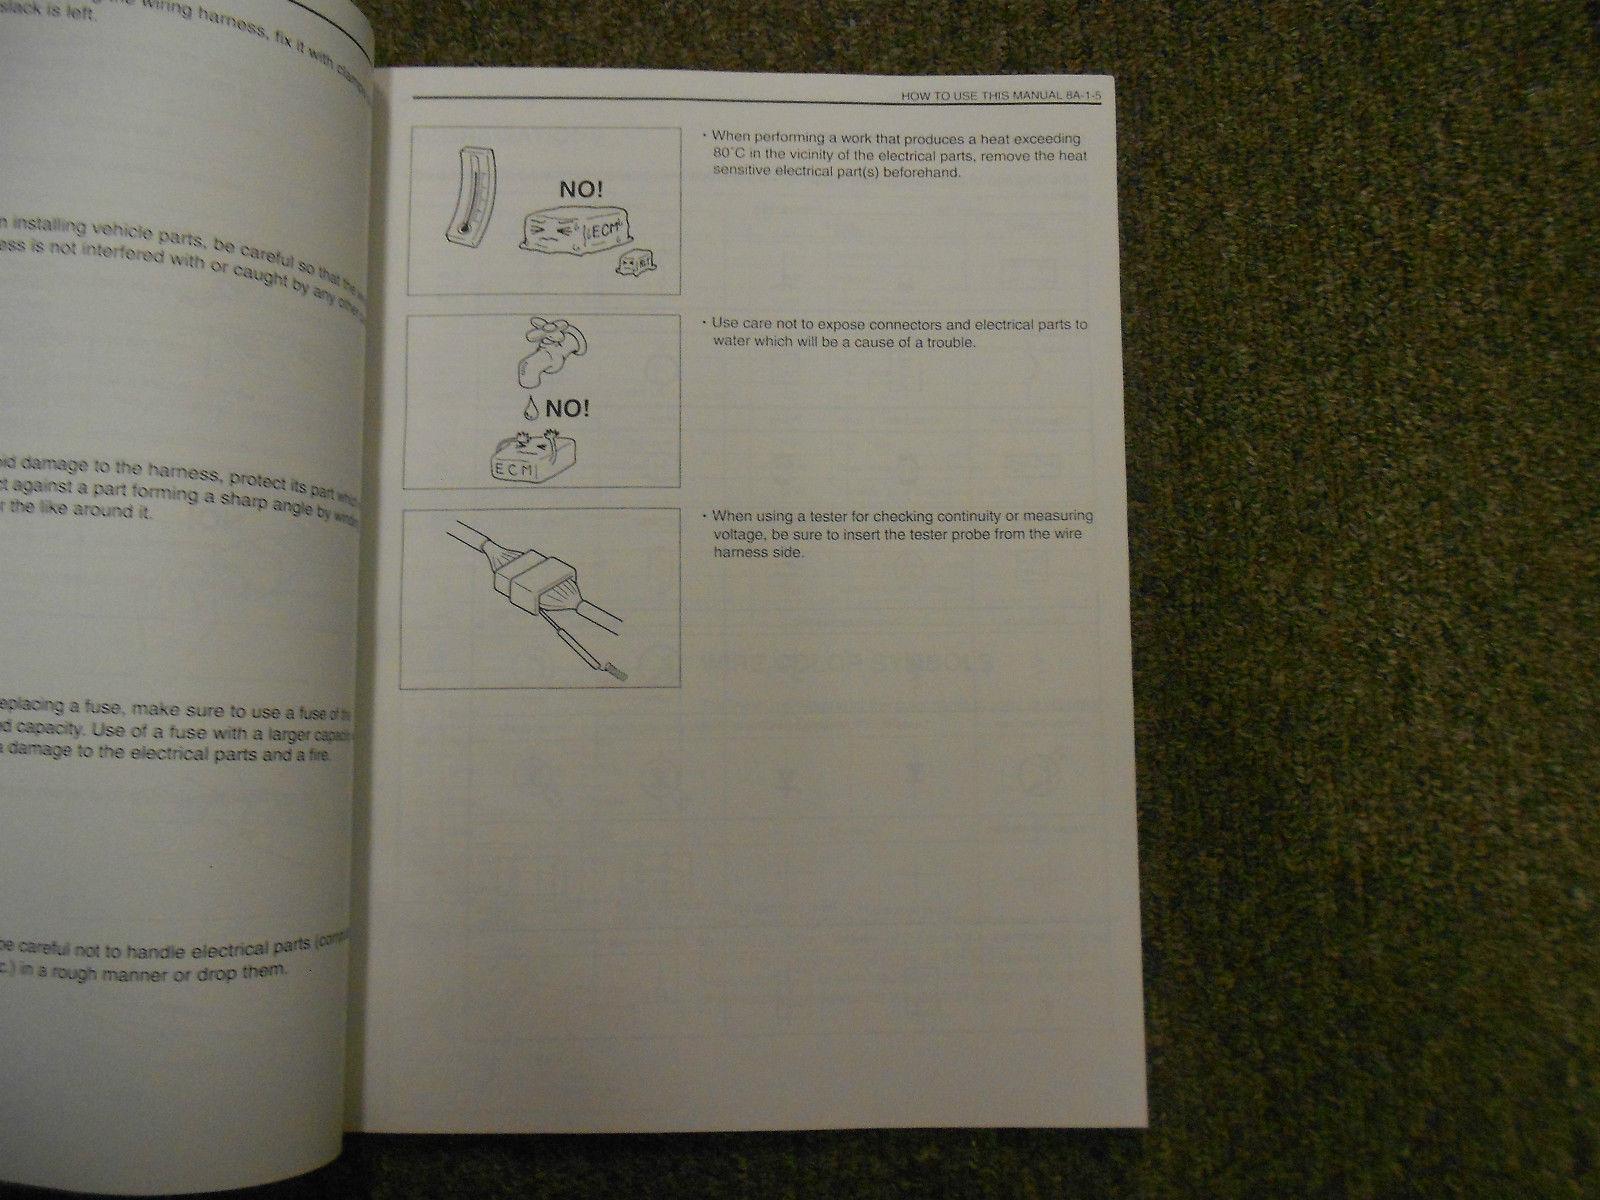 1995 Suzuki Esteem Wiring Diagram Shop Manual FACTORY OEM BOOK 95 2ND ED U.S VOL image 5